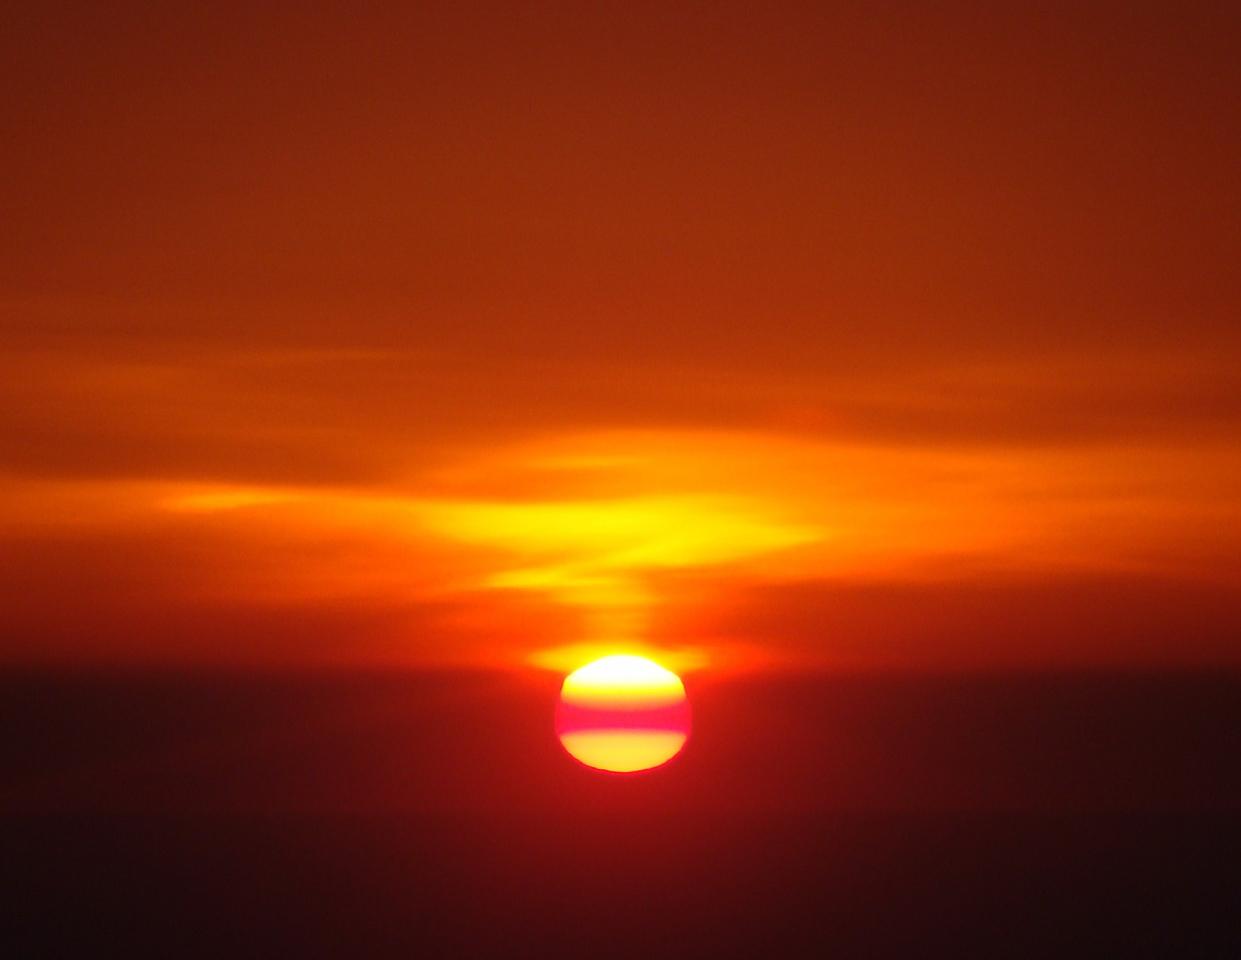 Sunset over Upstate New York